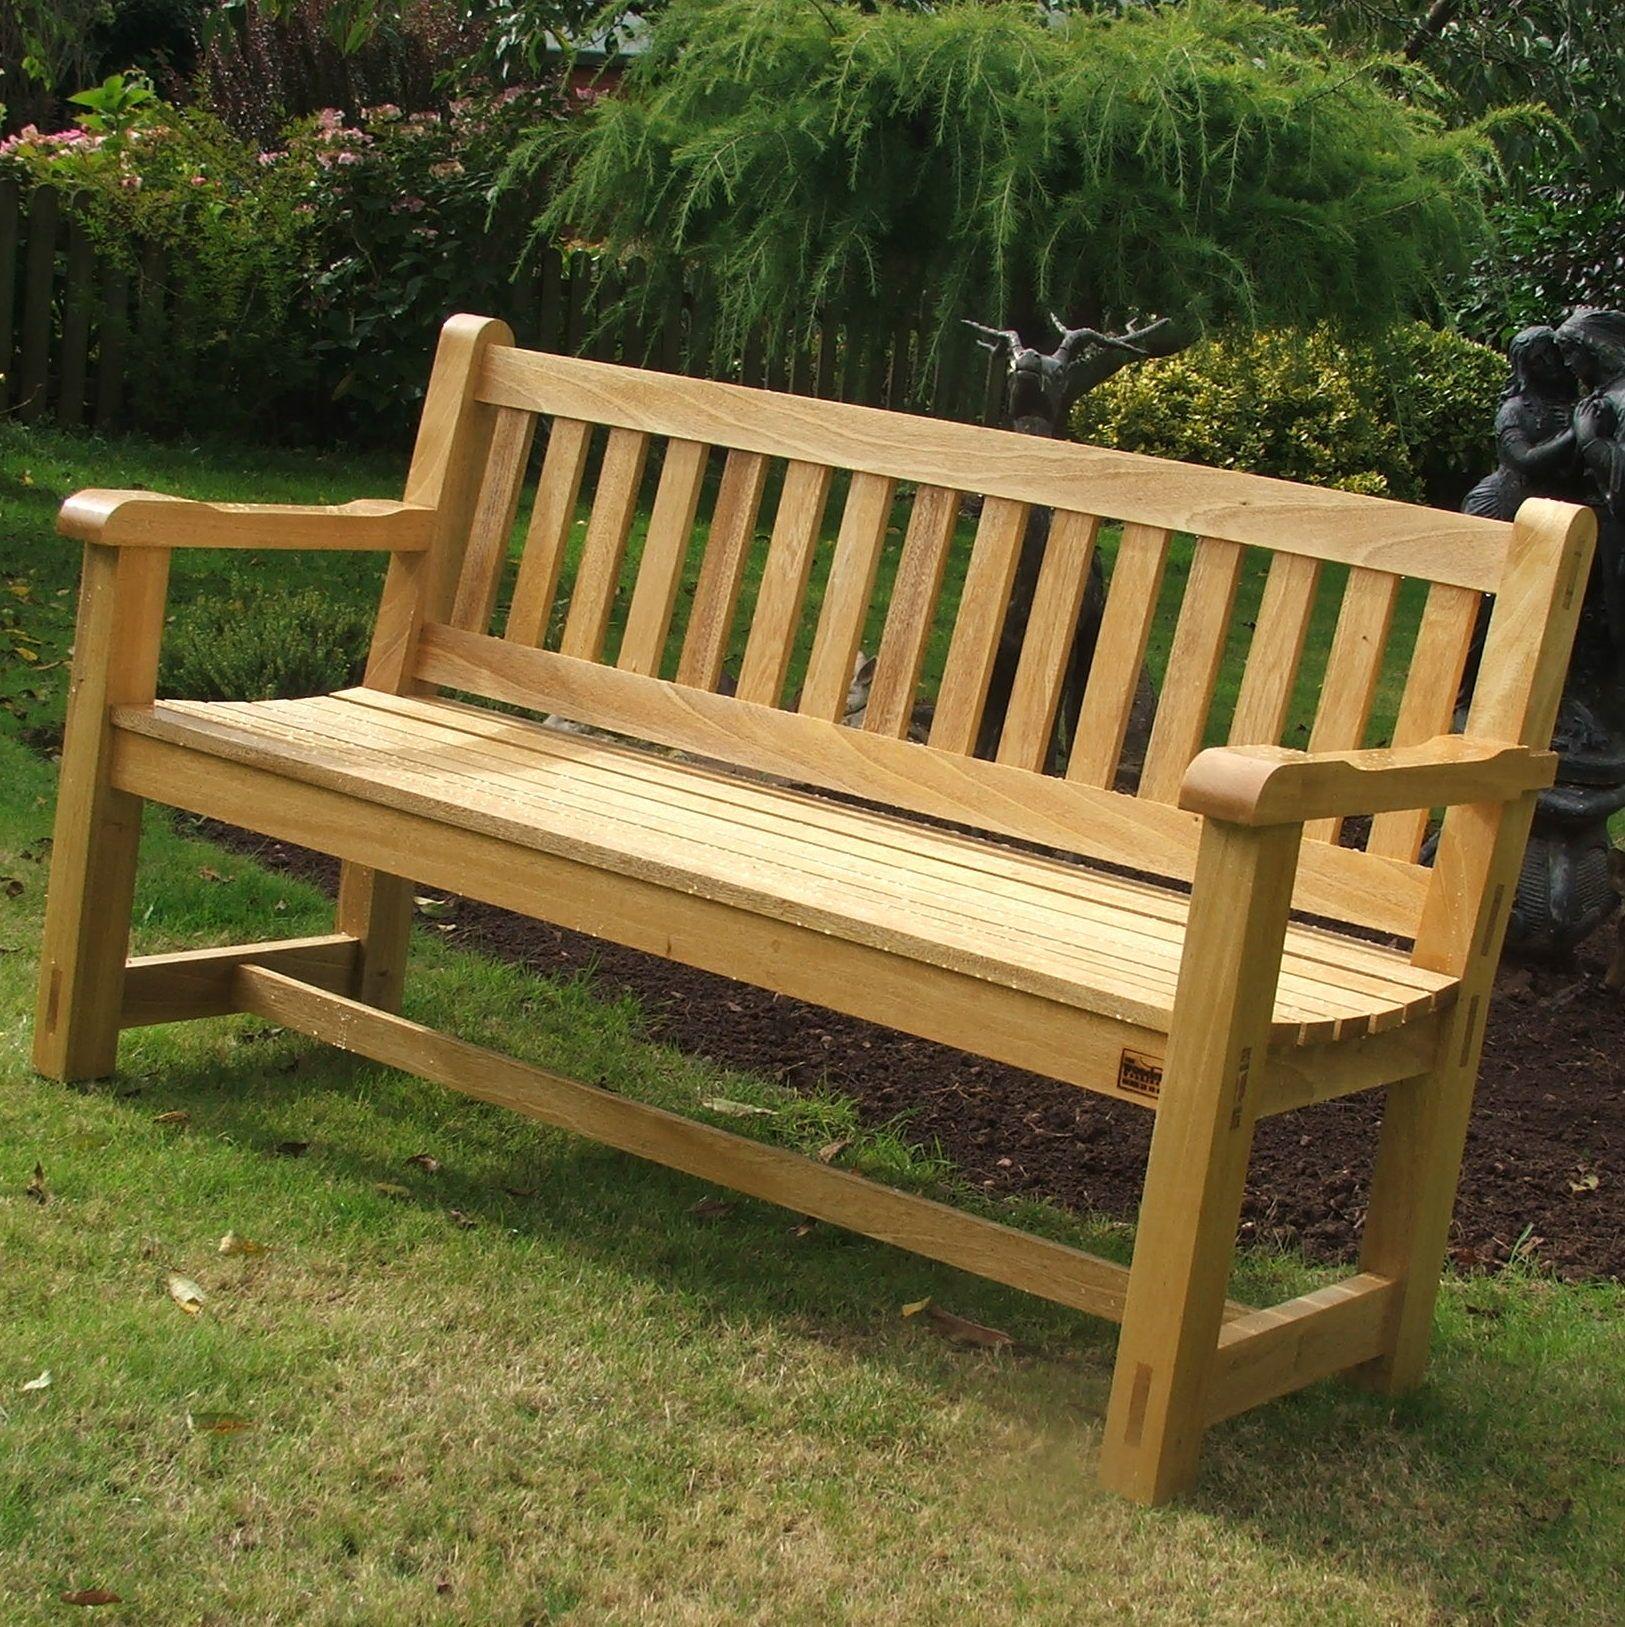 Inspiring Wooden Garden Benches #2 Wooden Garden Bench Intended For Coleen Outdoor Teak Garden Benches (View 2 of 25)